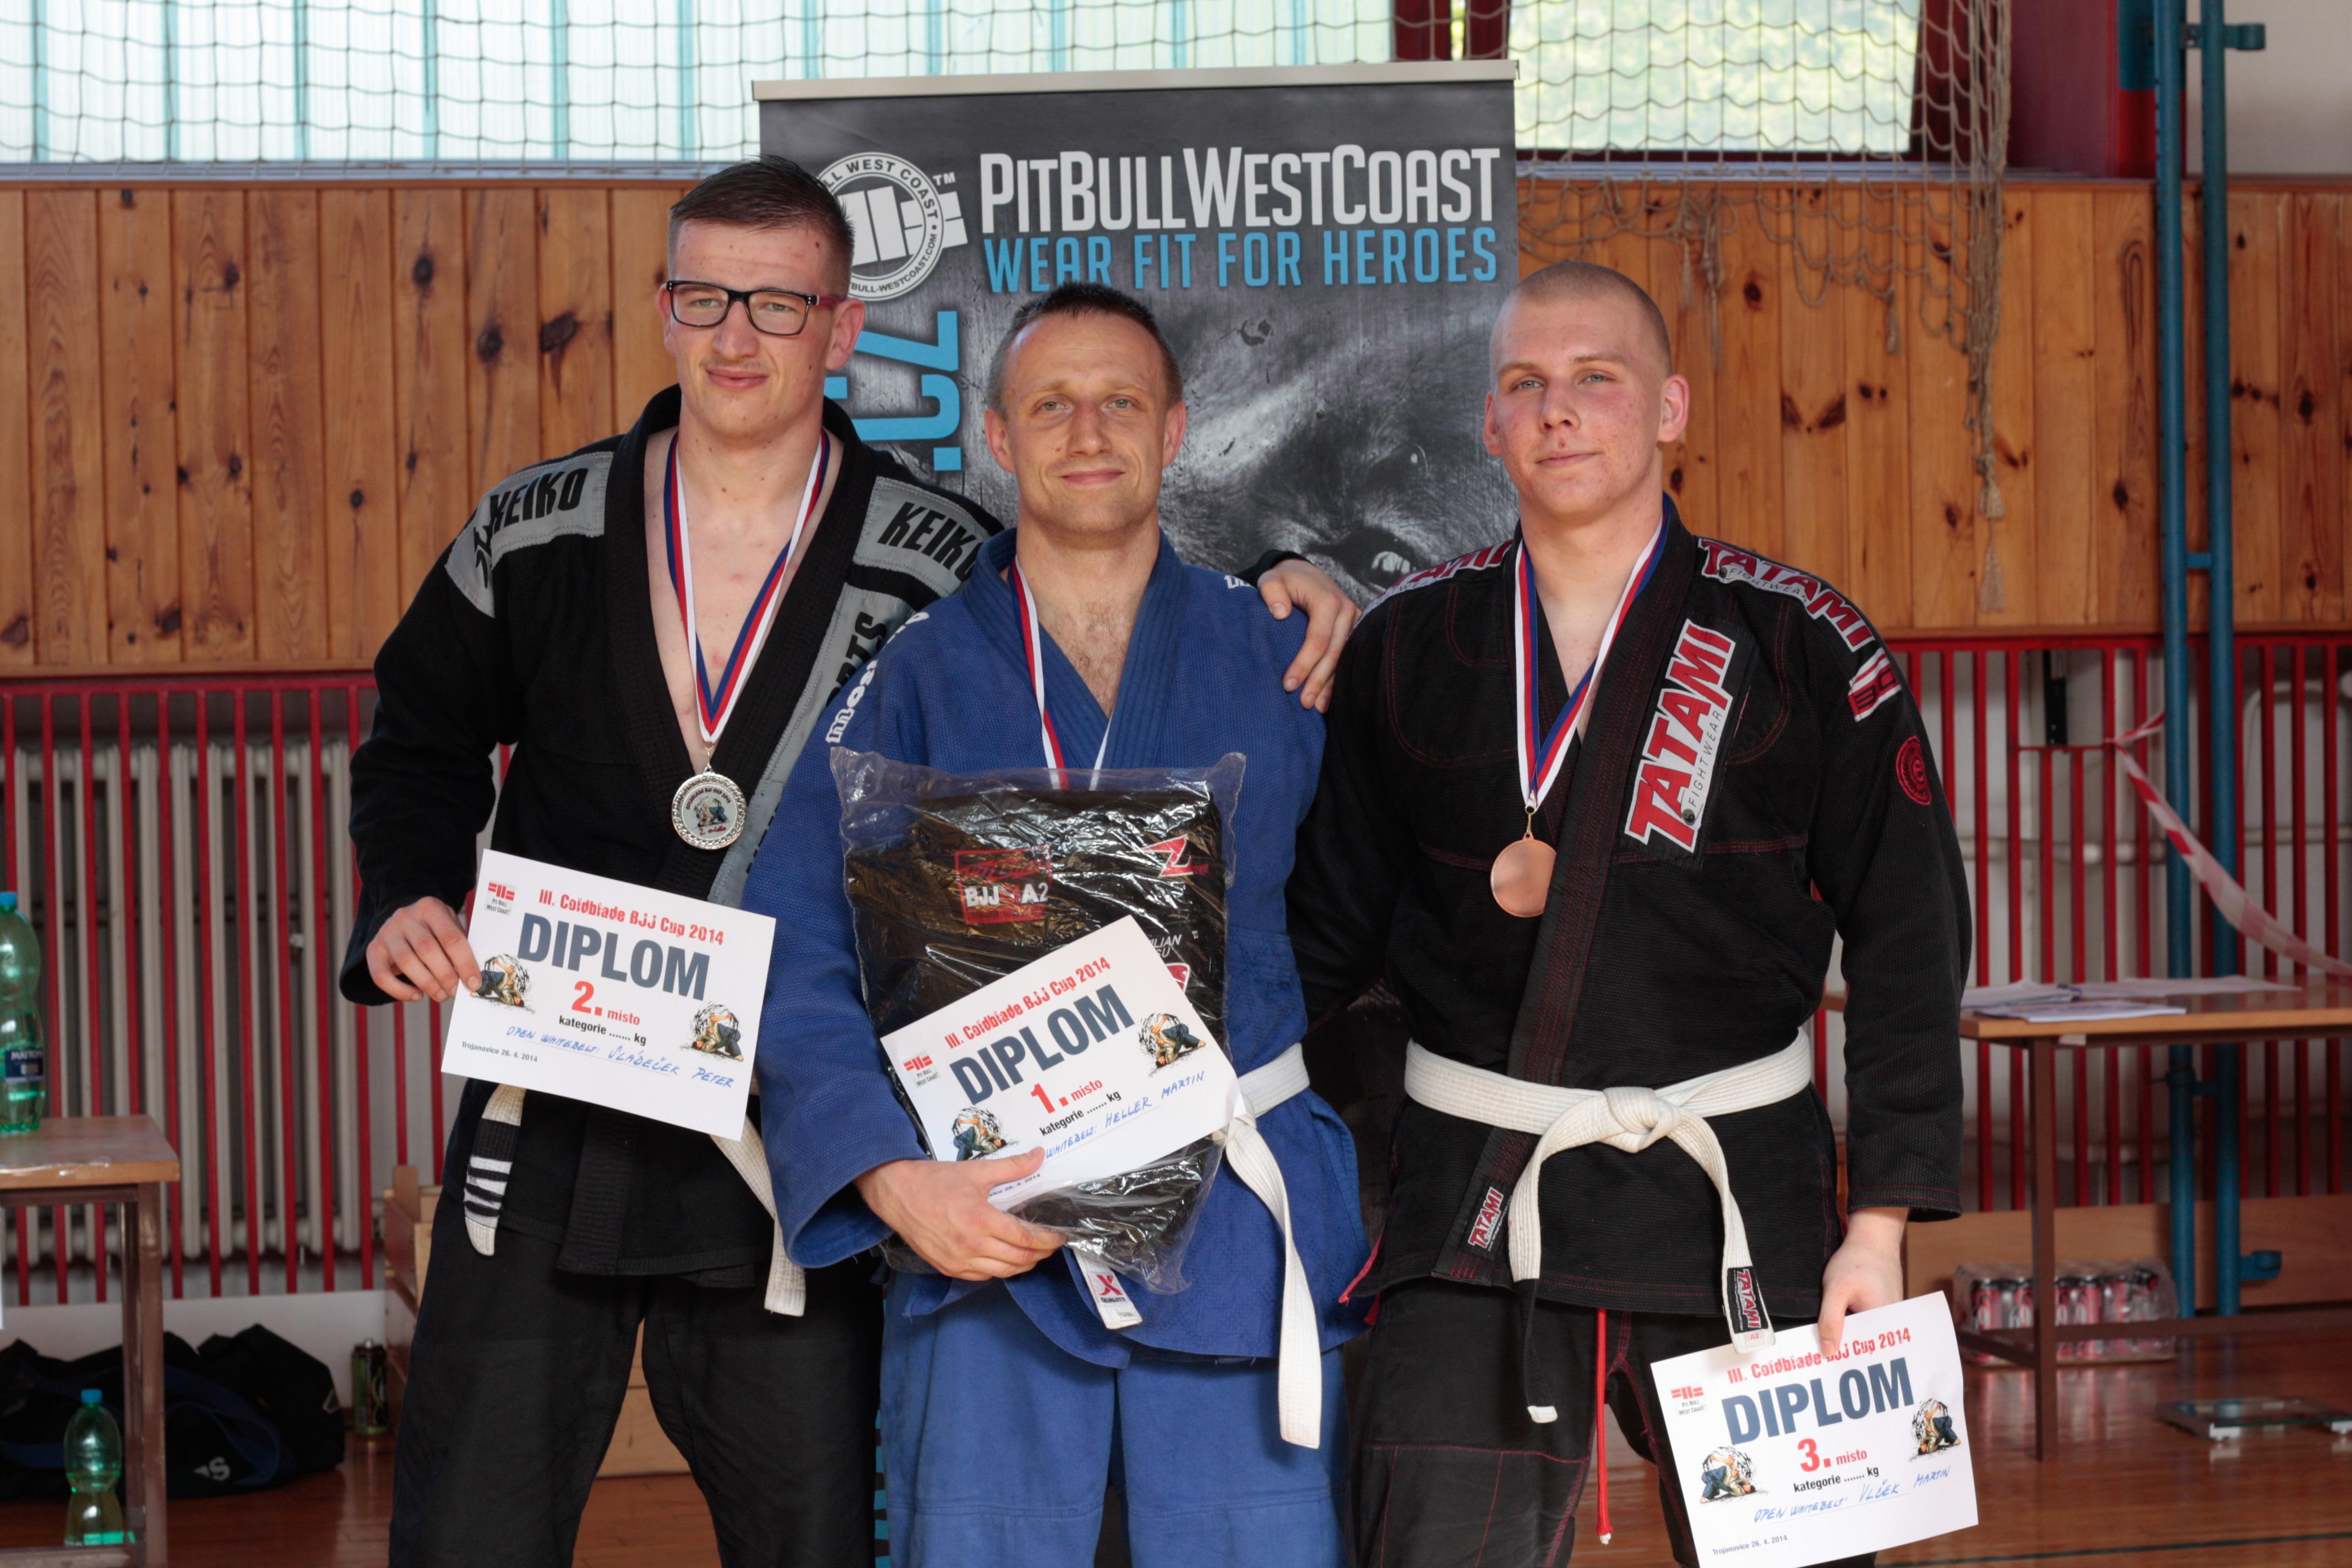 Martin Heller vybojoval na turnaji v Trojanovicích i kategorii open white belt